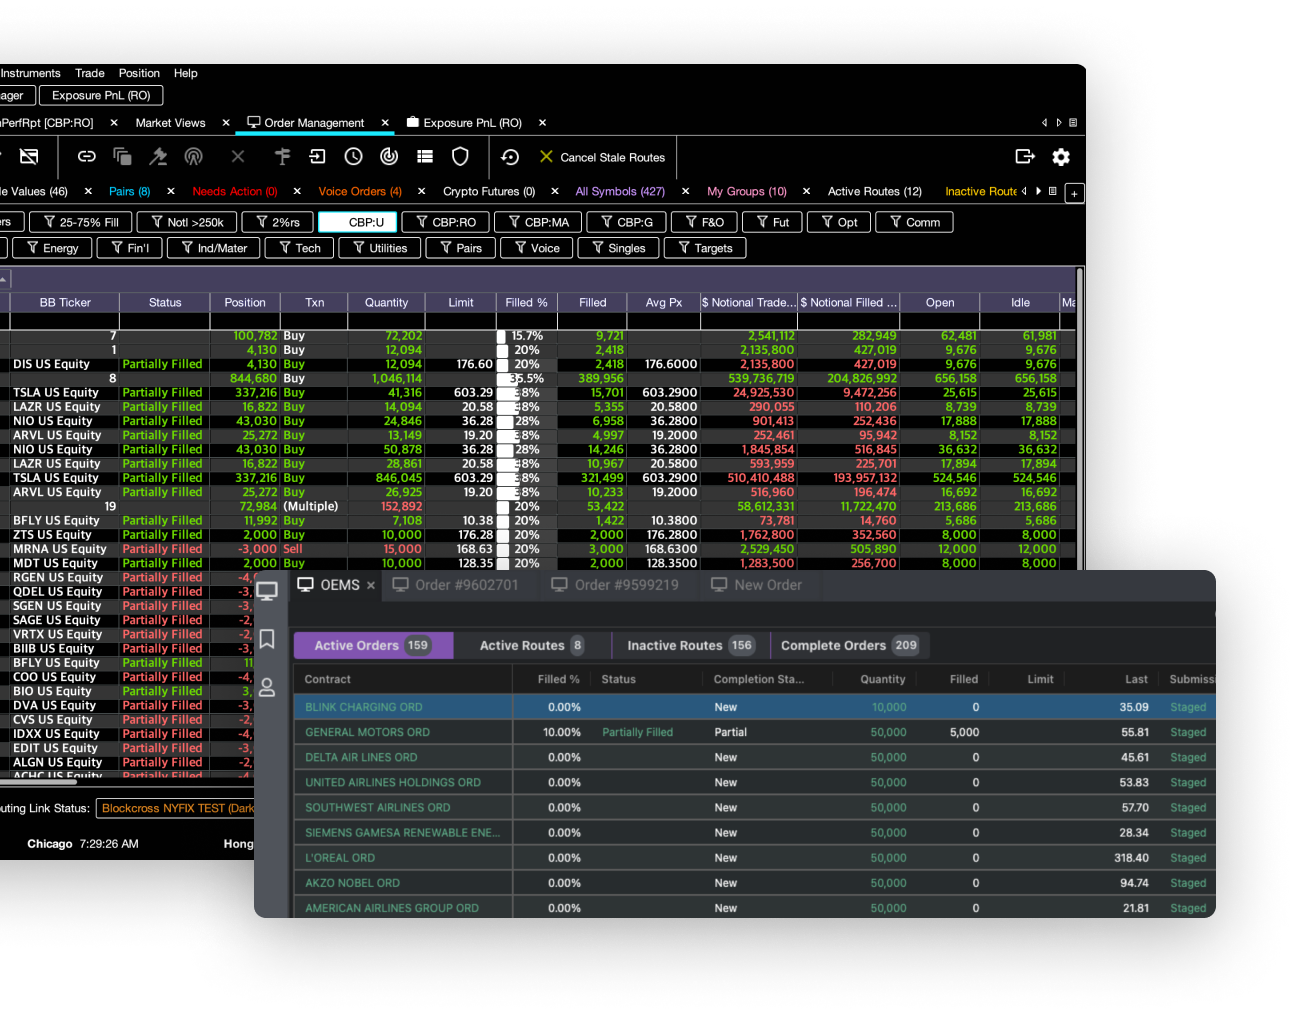 Trader_BodyScreens_Desktop